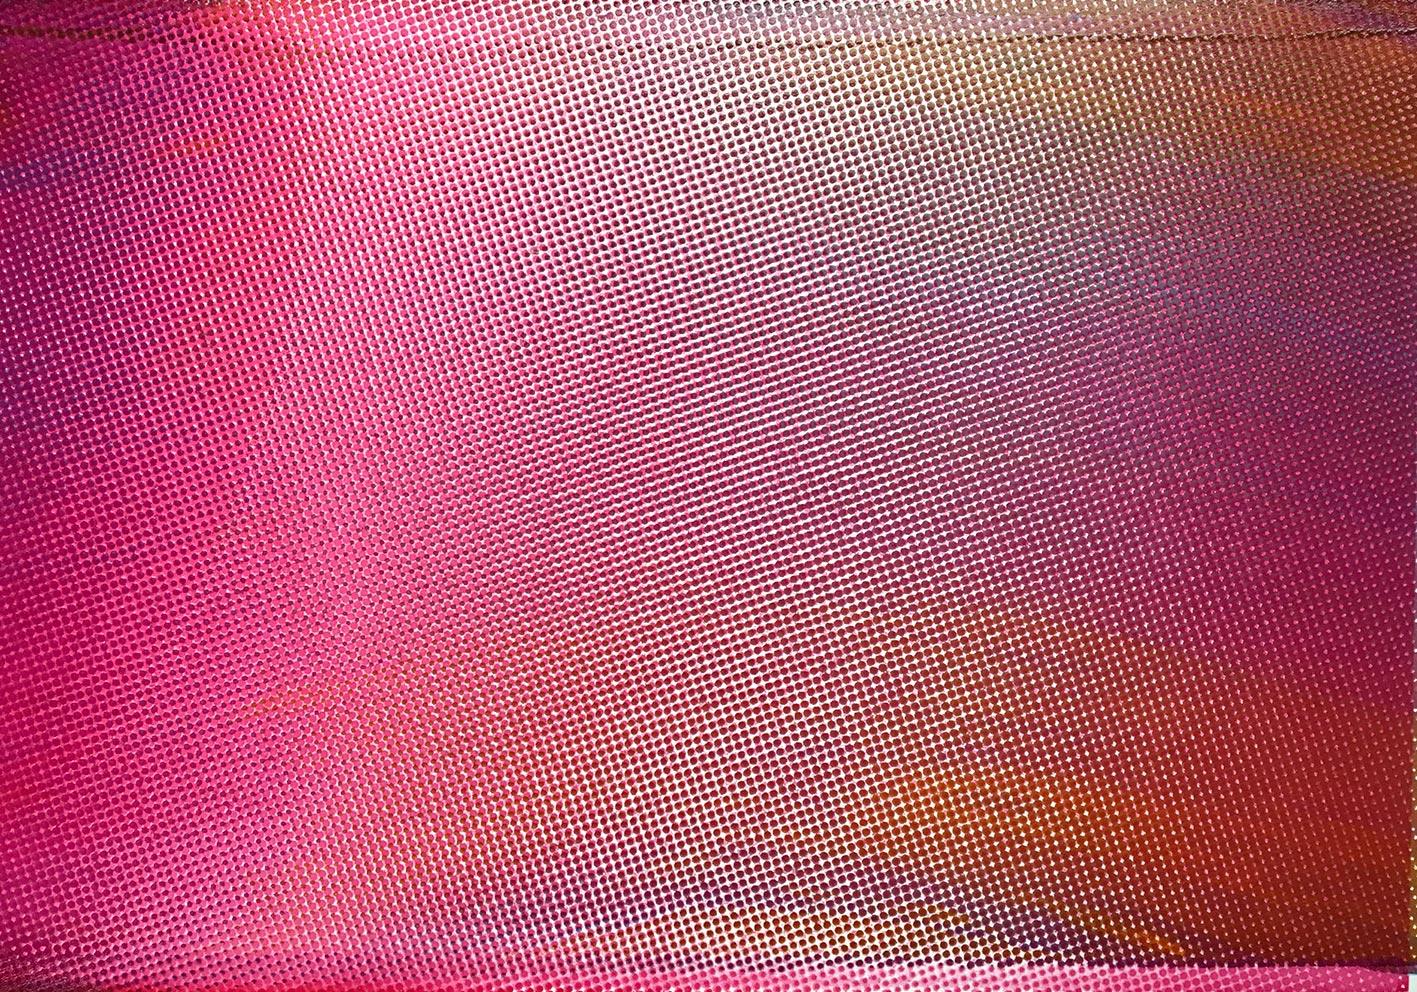 half_tone_gradient 0202w.jpg